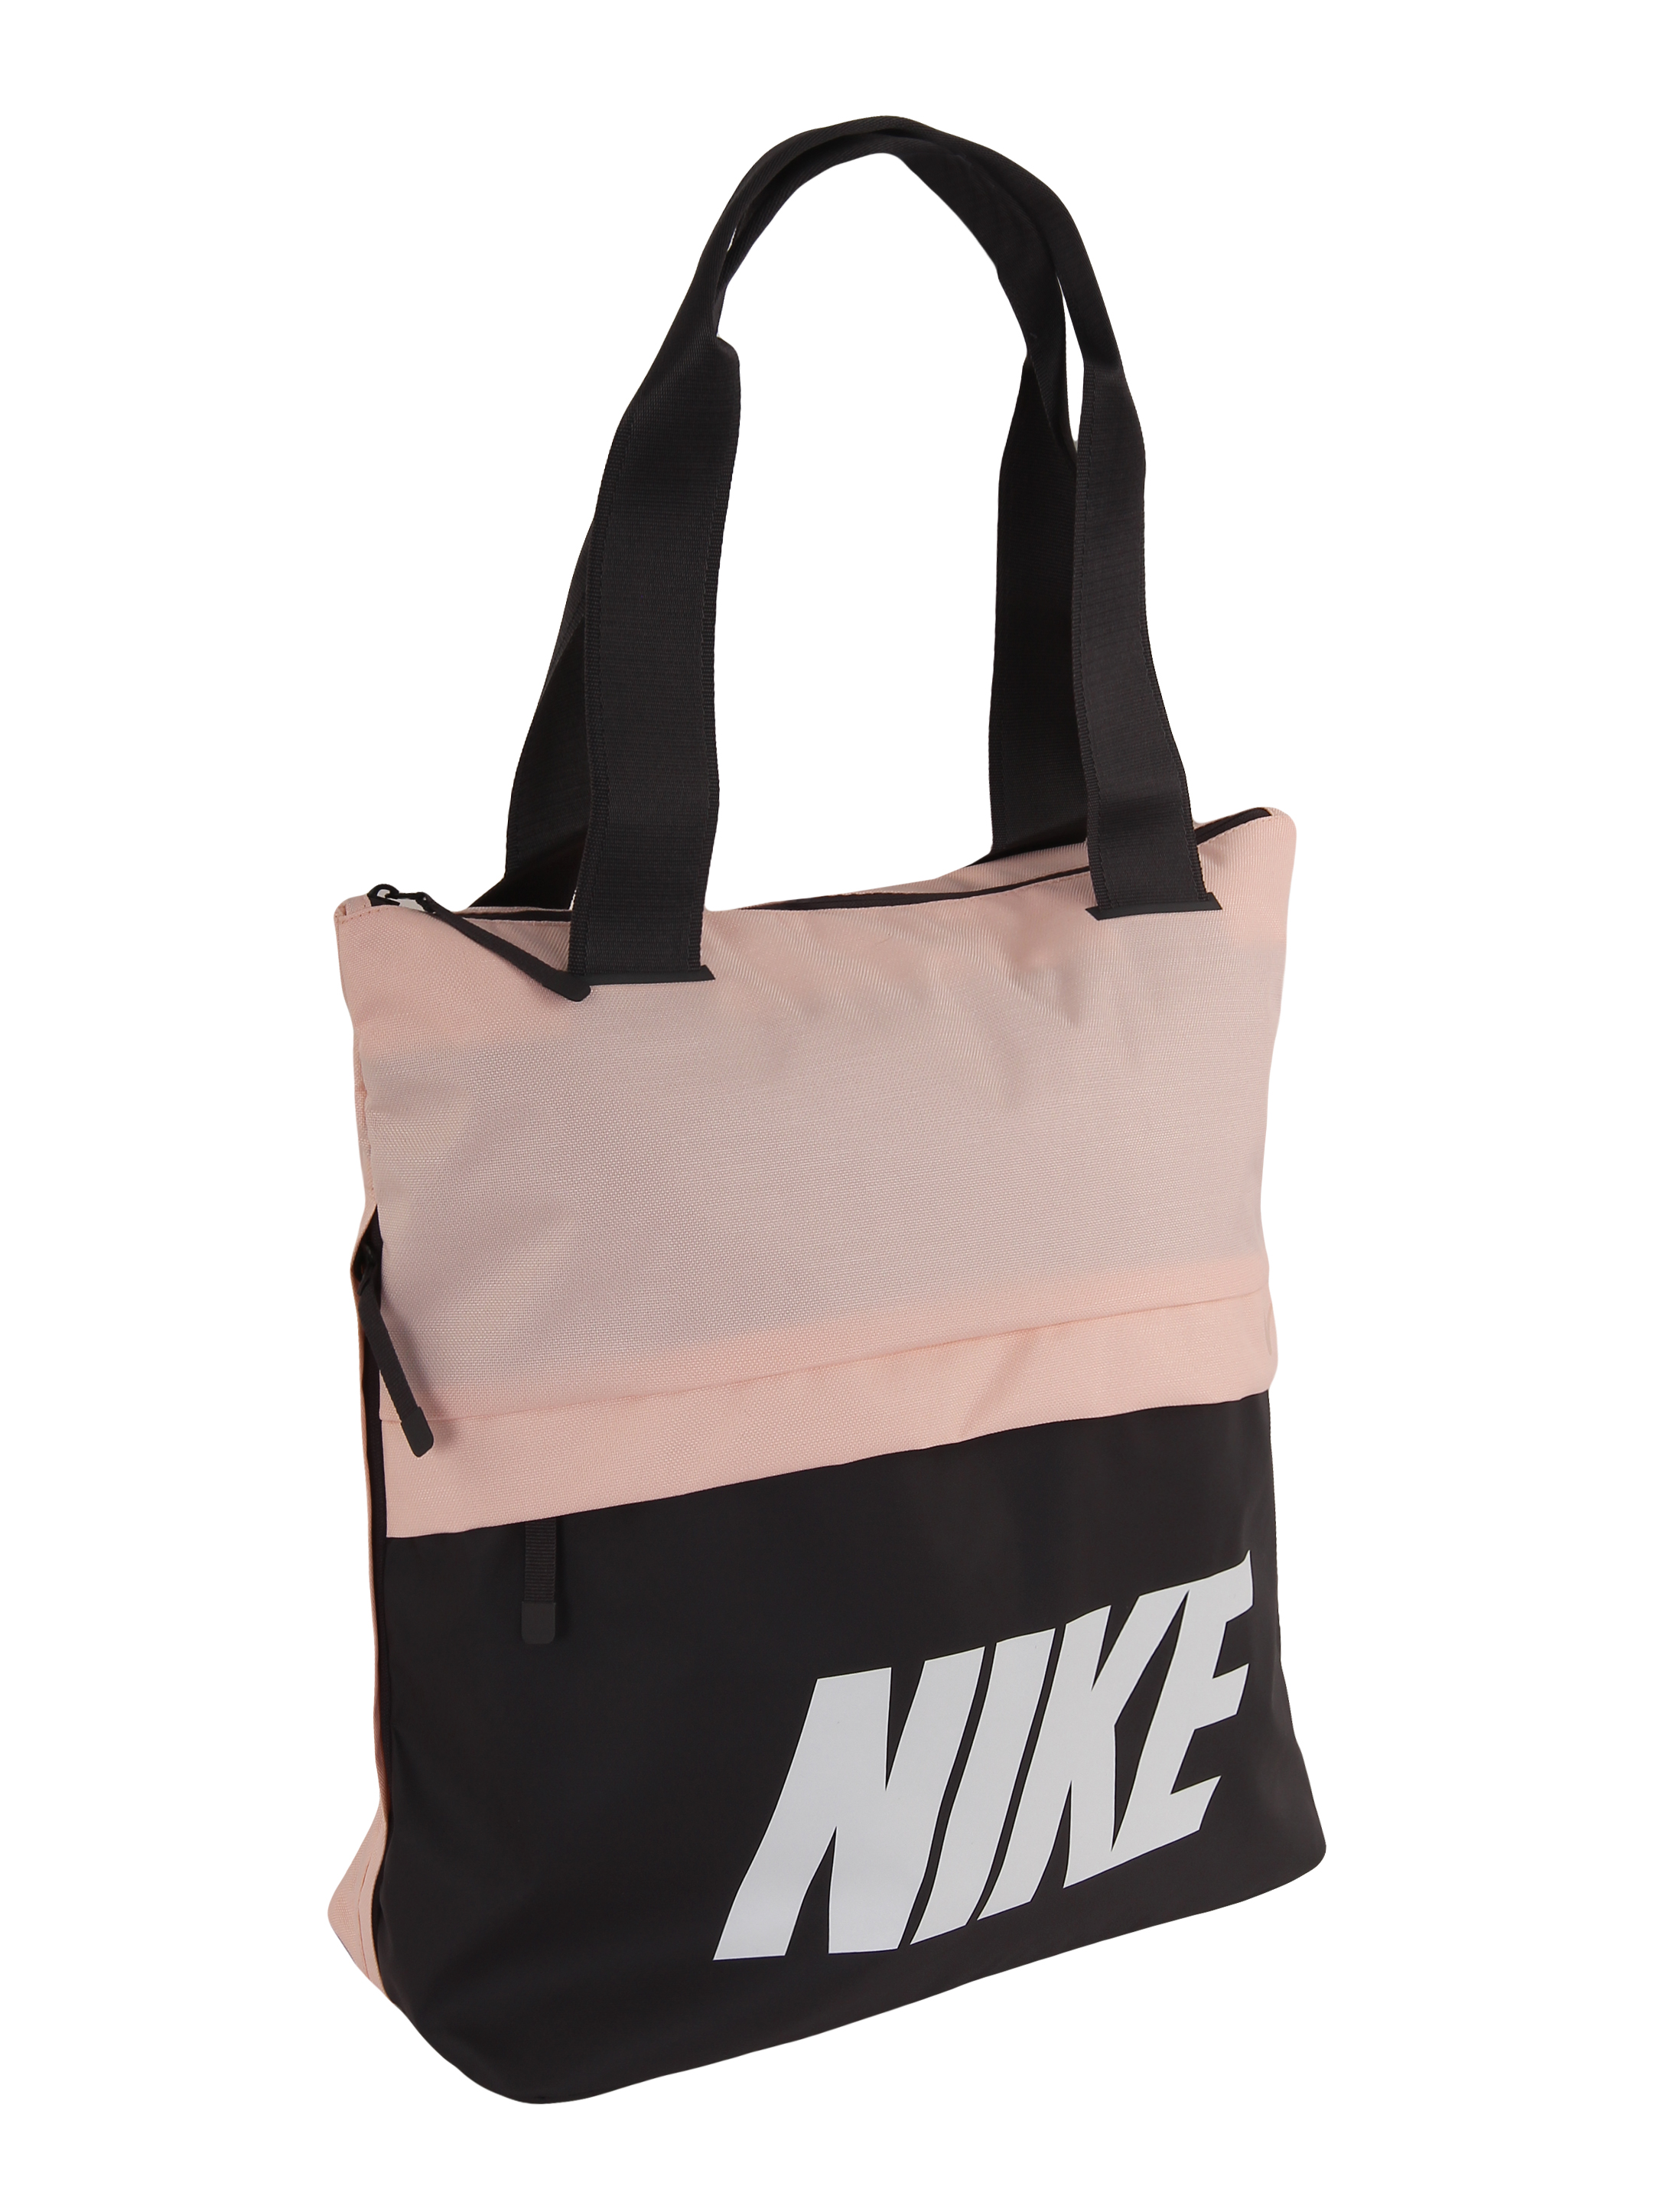 2ac136a0a5d9 Сумка Nike Radiate - Сеть спортивных магазинов Чемпион